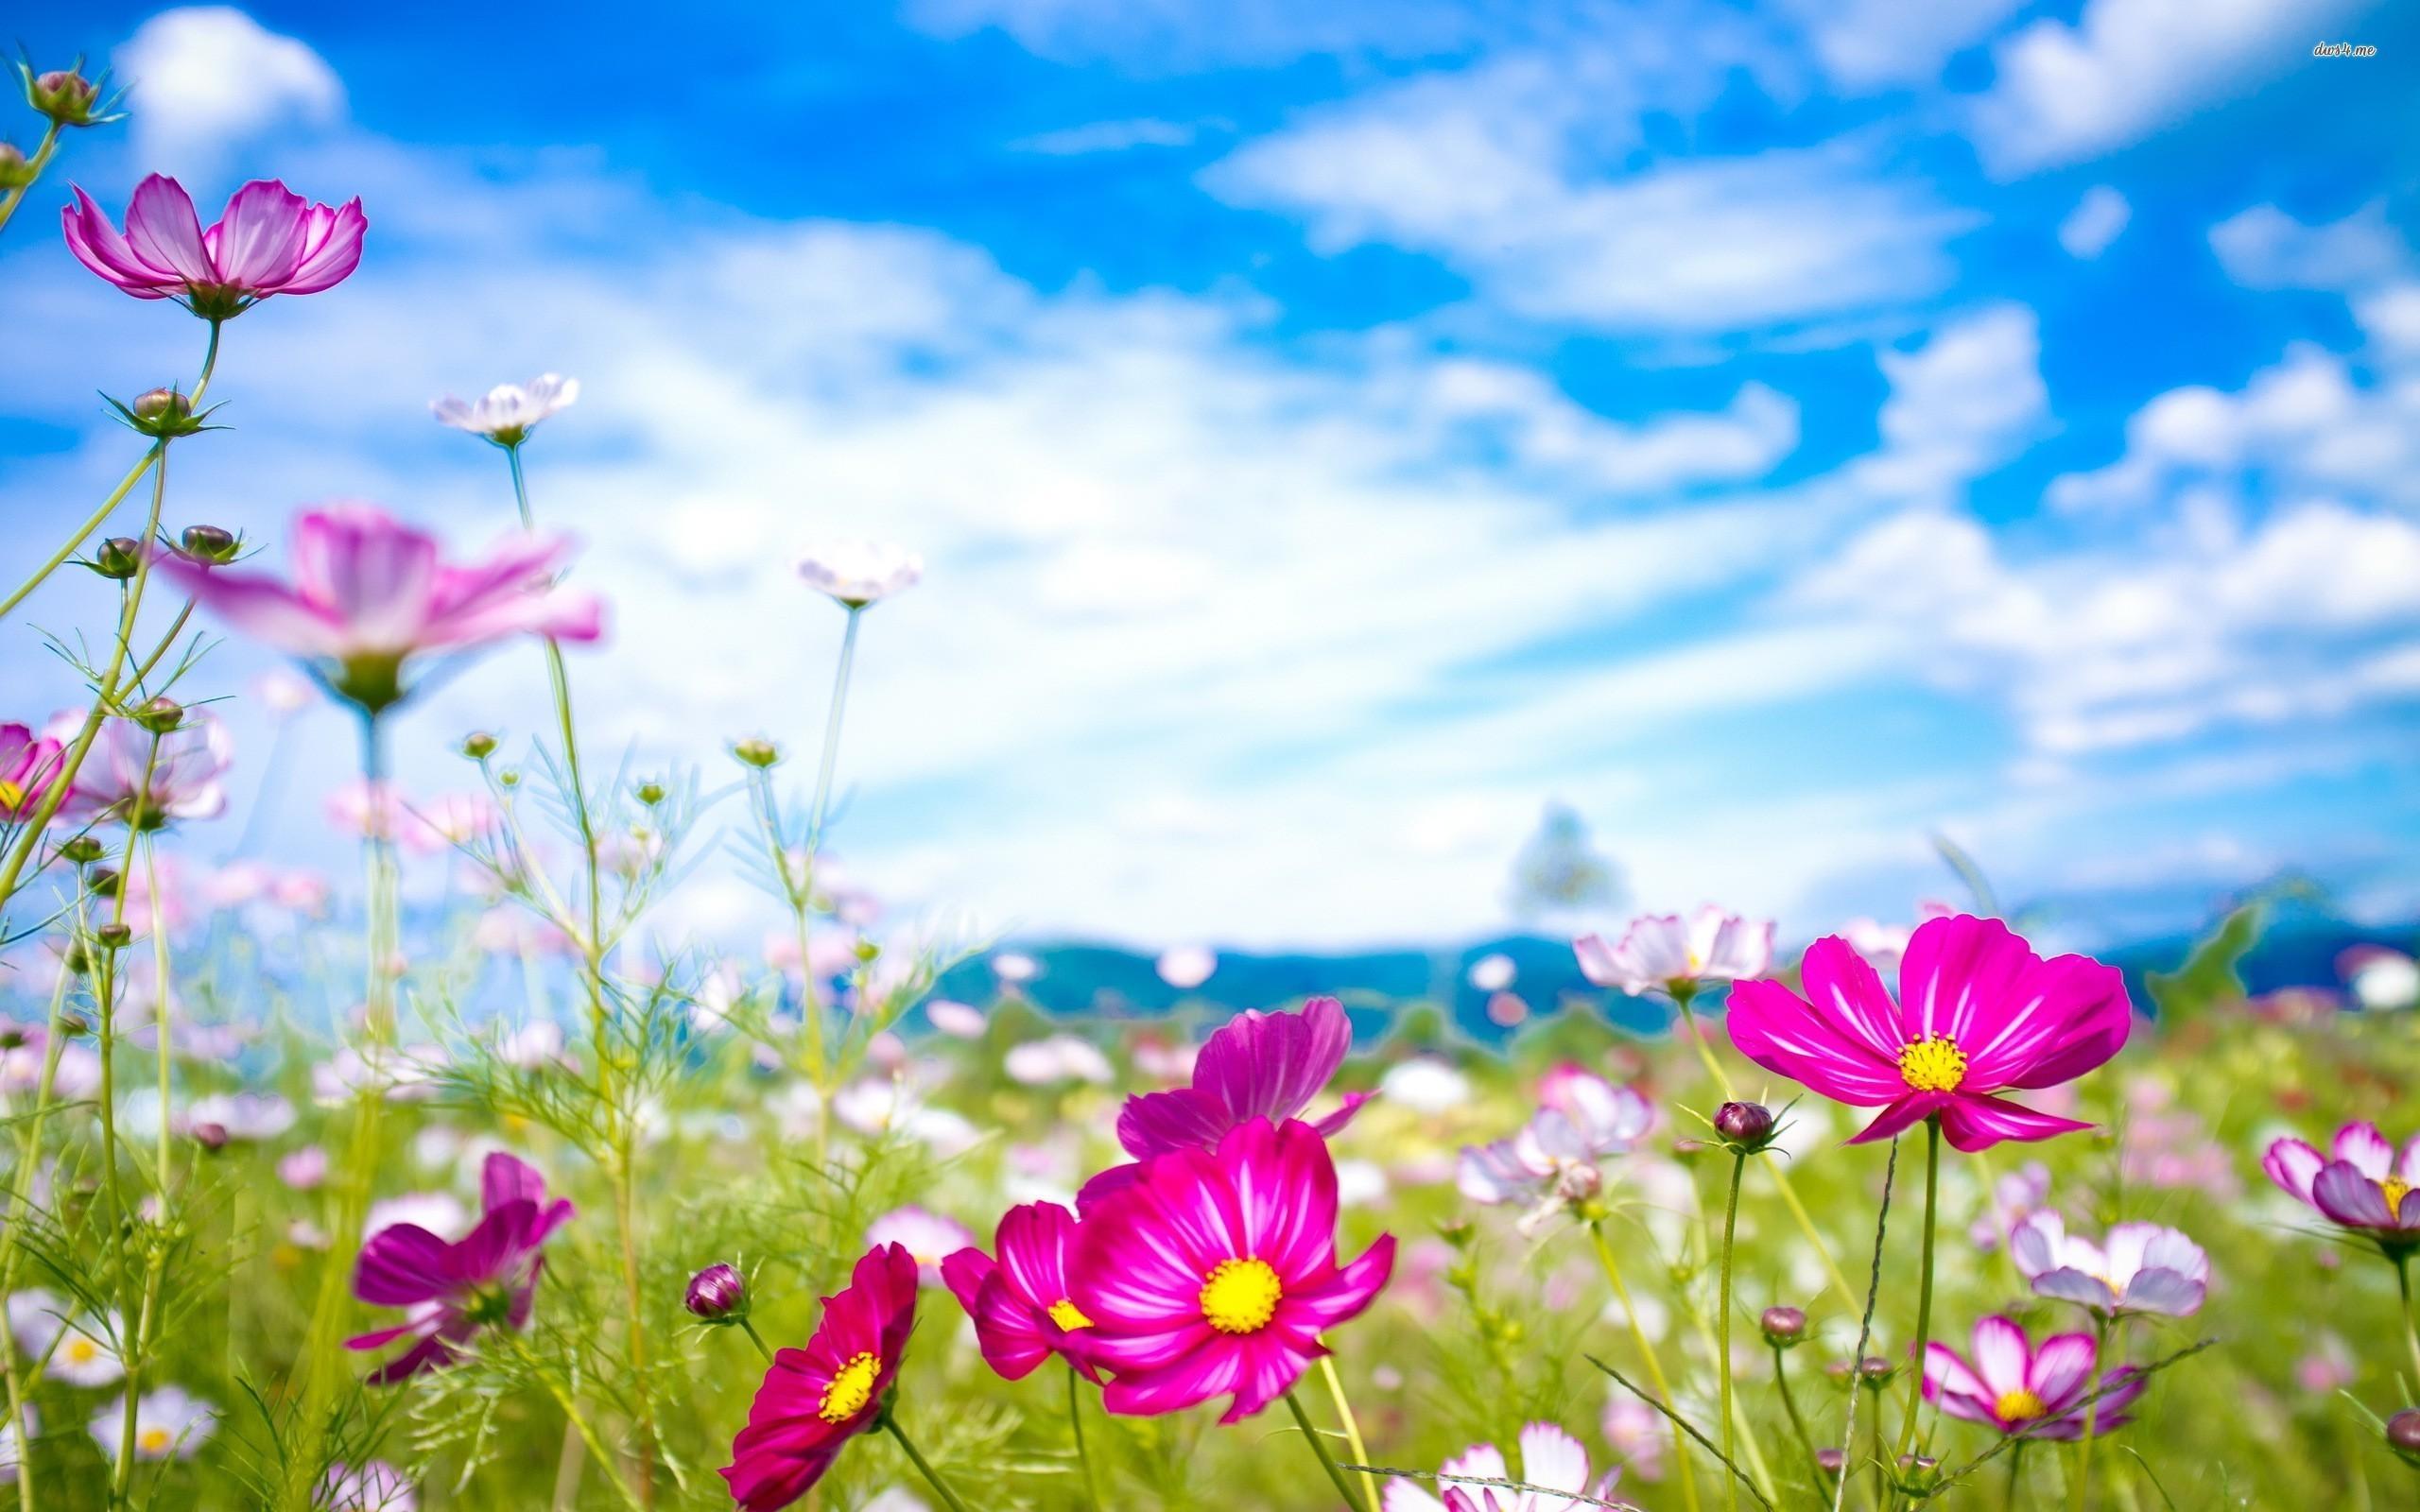 Bright Flower Wallpaper 43 Images